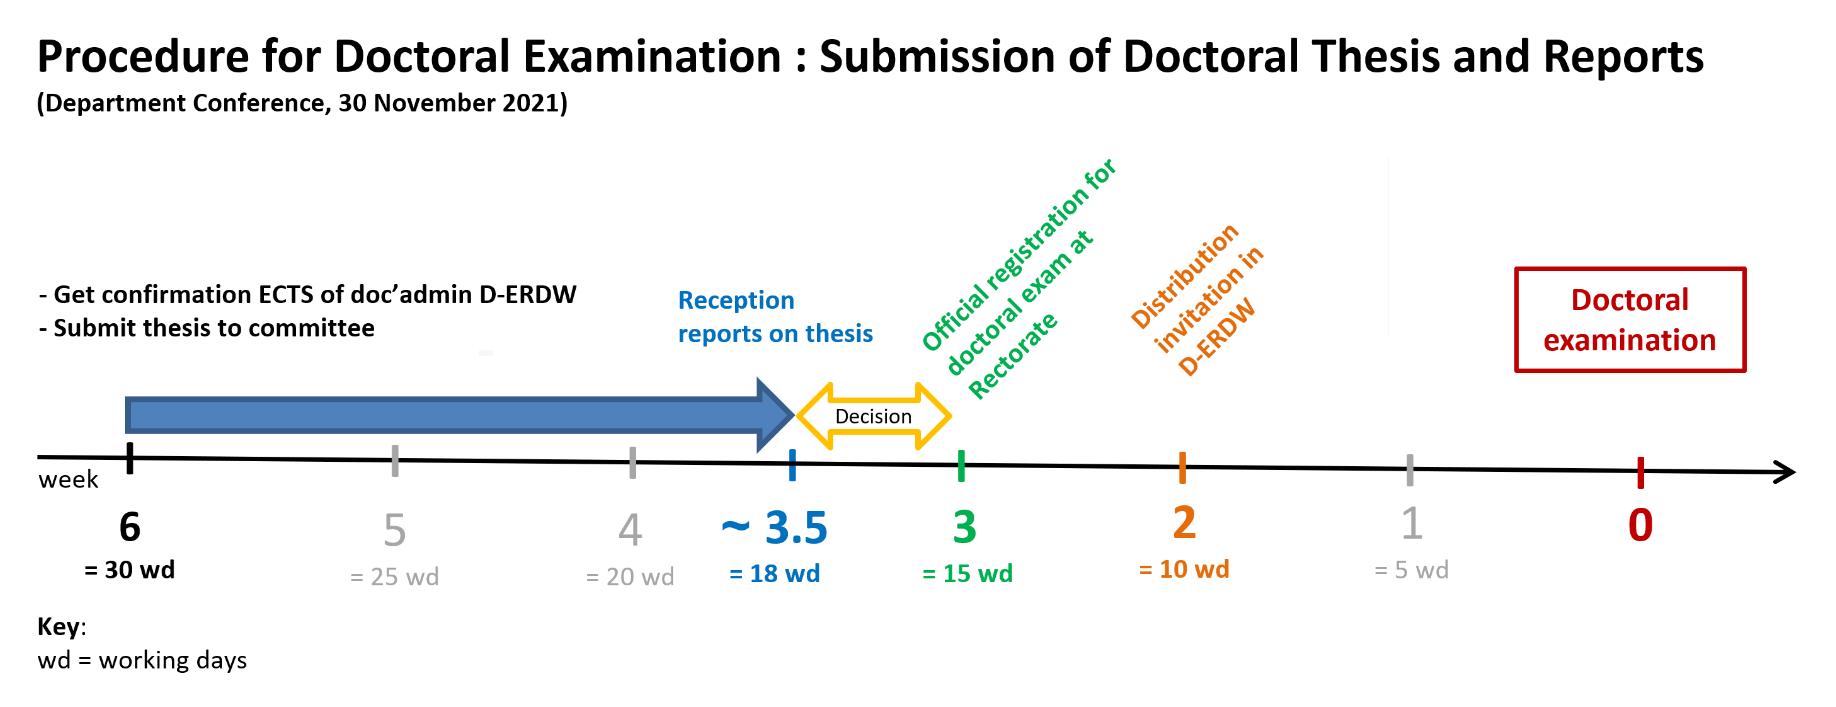 Doctoral dissertation examination